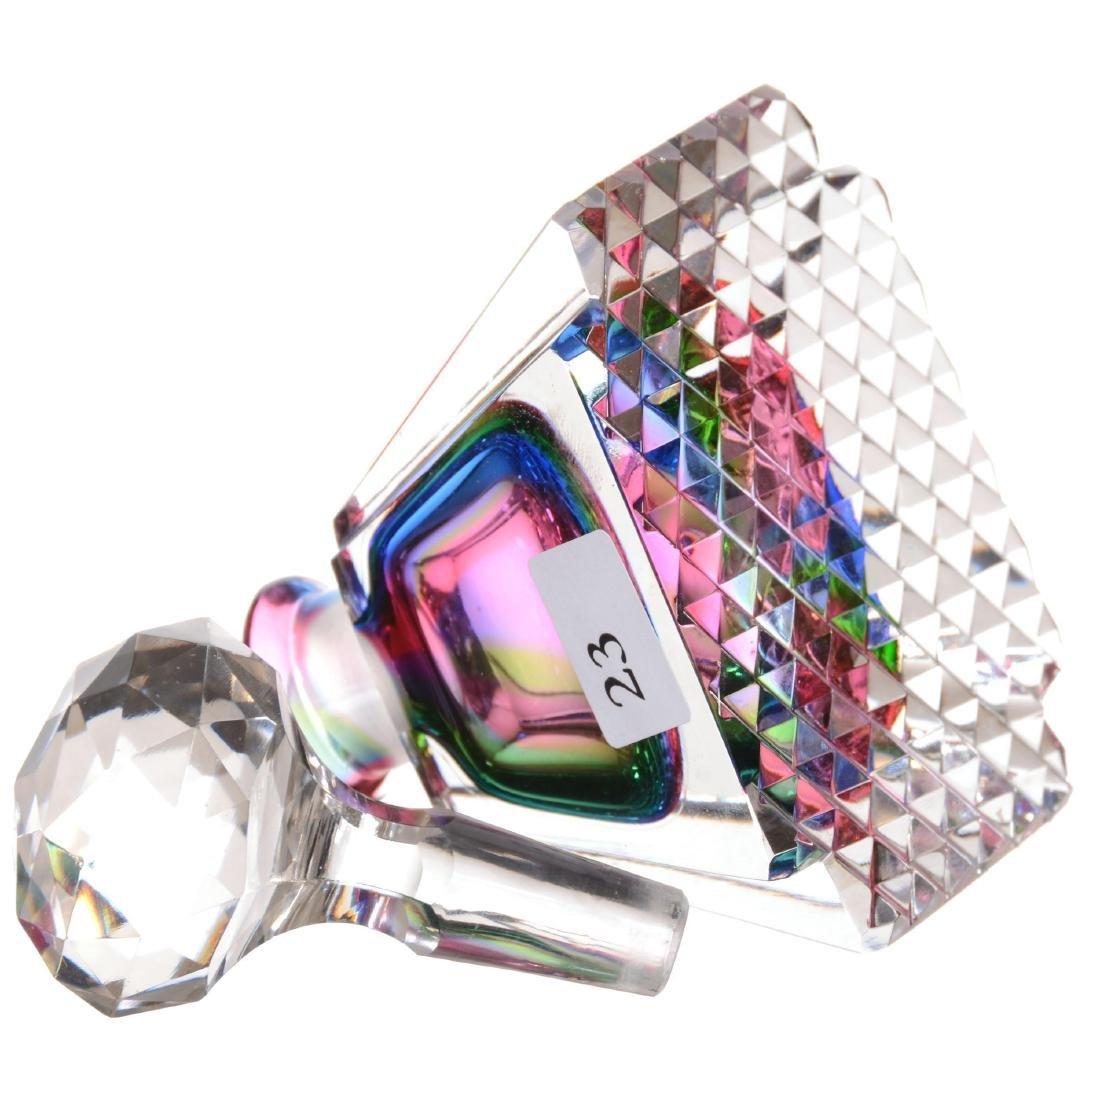 Perfume Bottle - 2